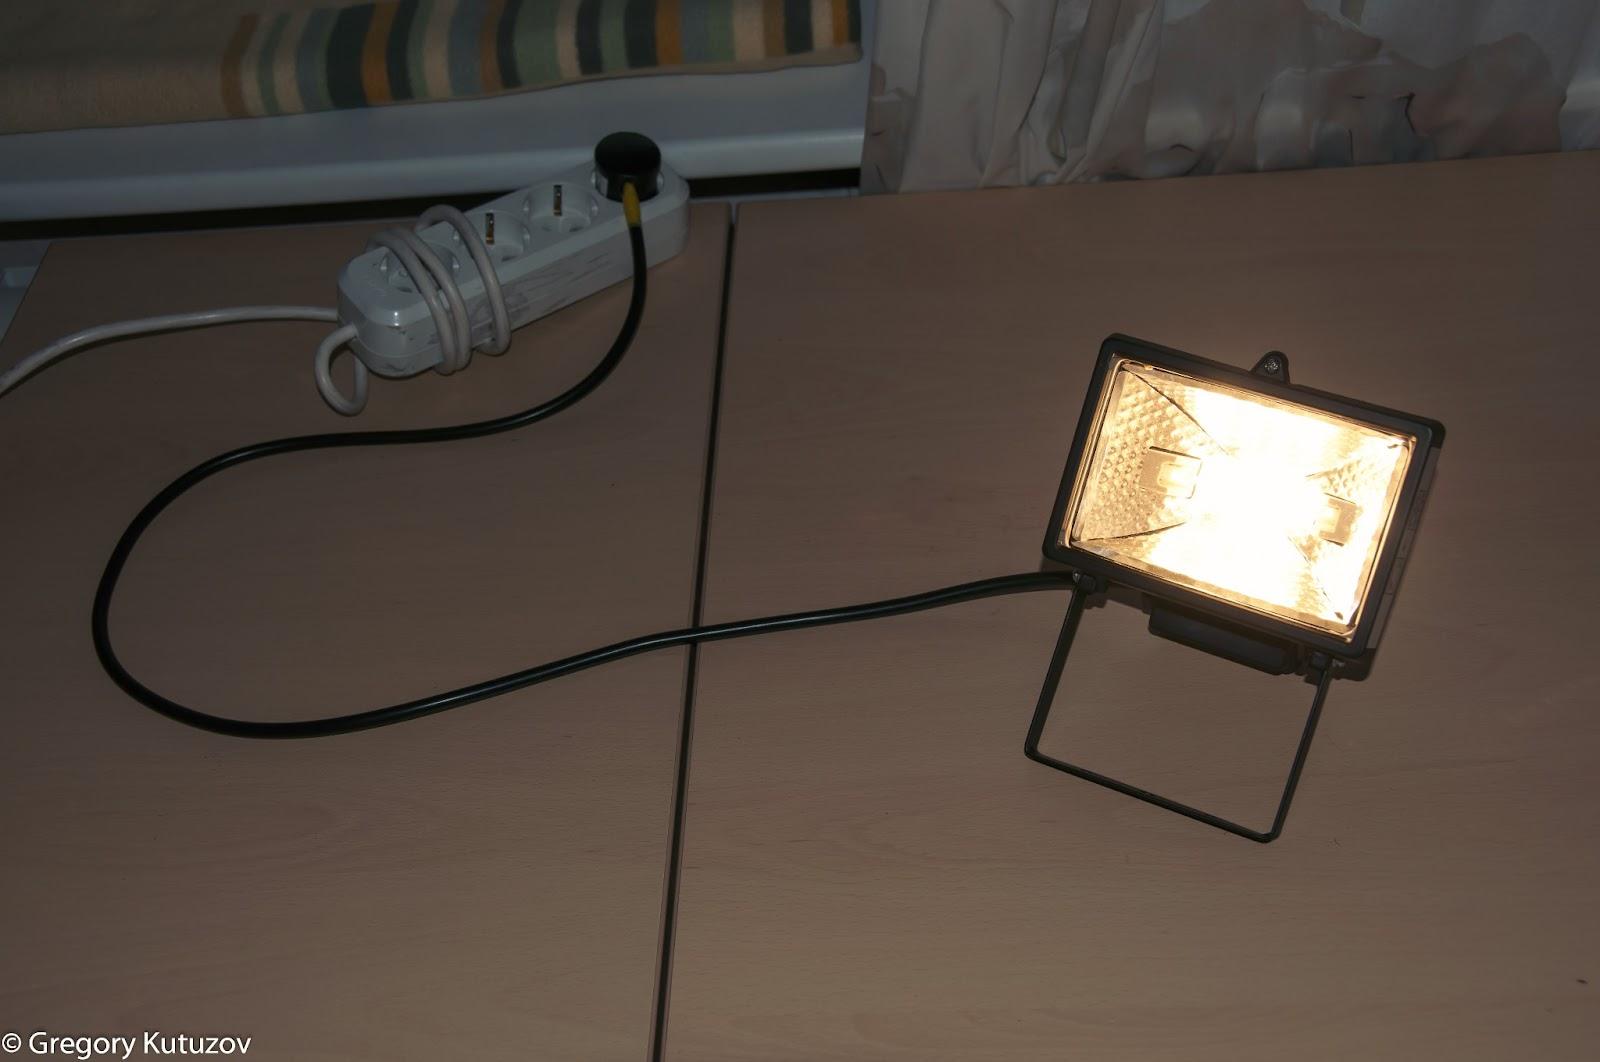 Лайтбокс светильник своими руками